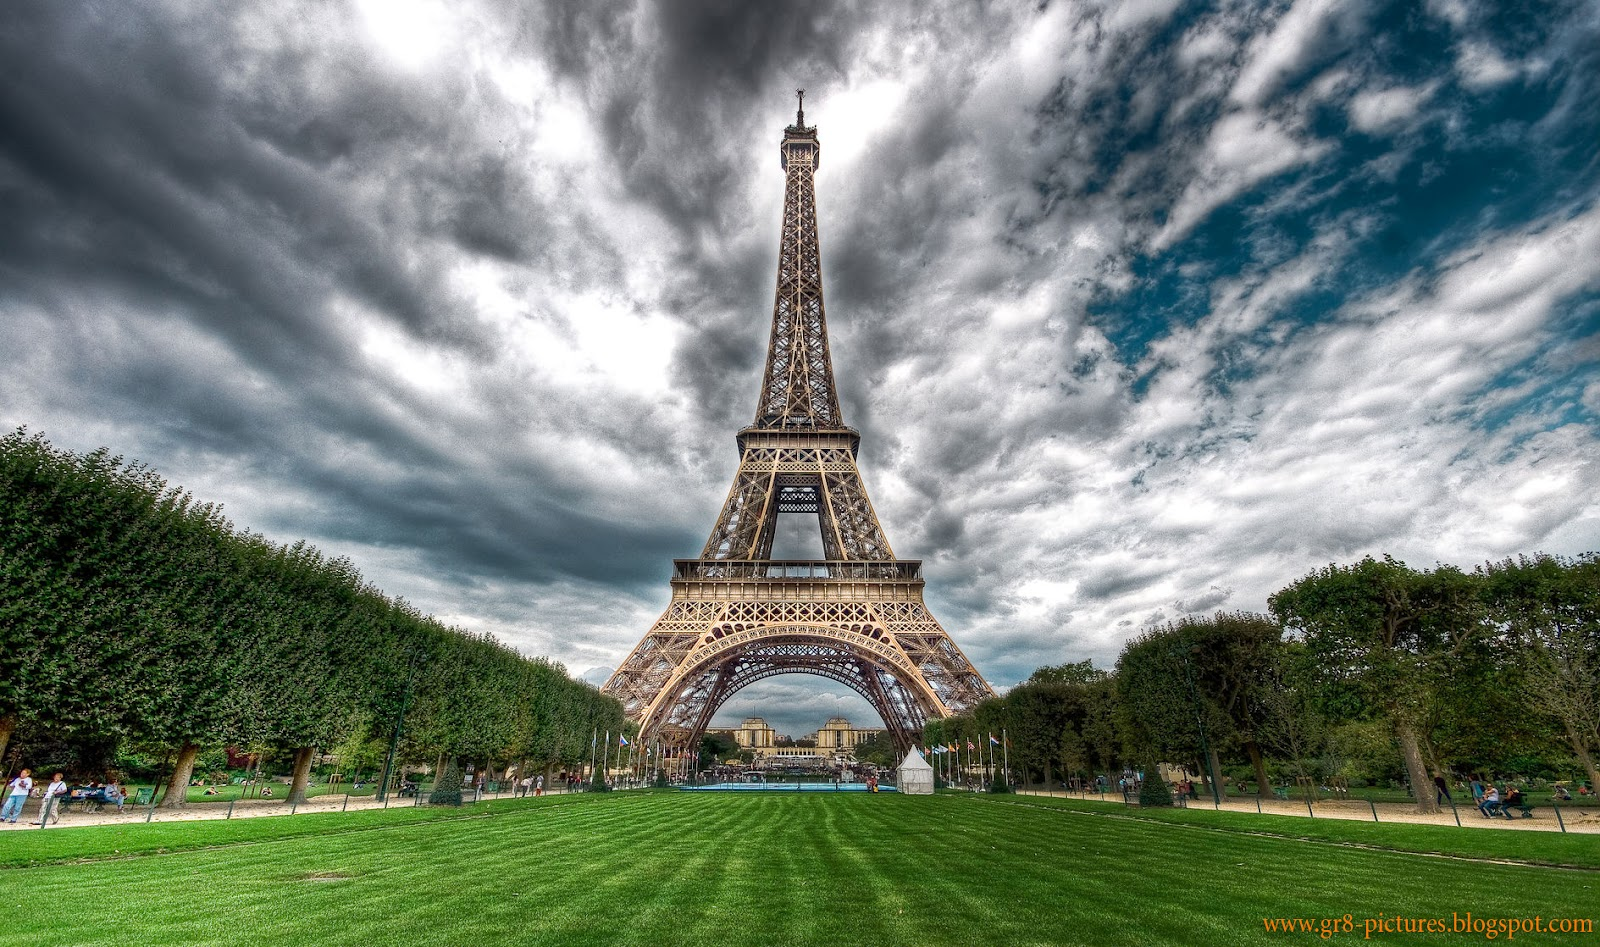 Hd wallpapers eiffel tower paris - Paris tower live wallpaper ...